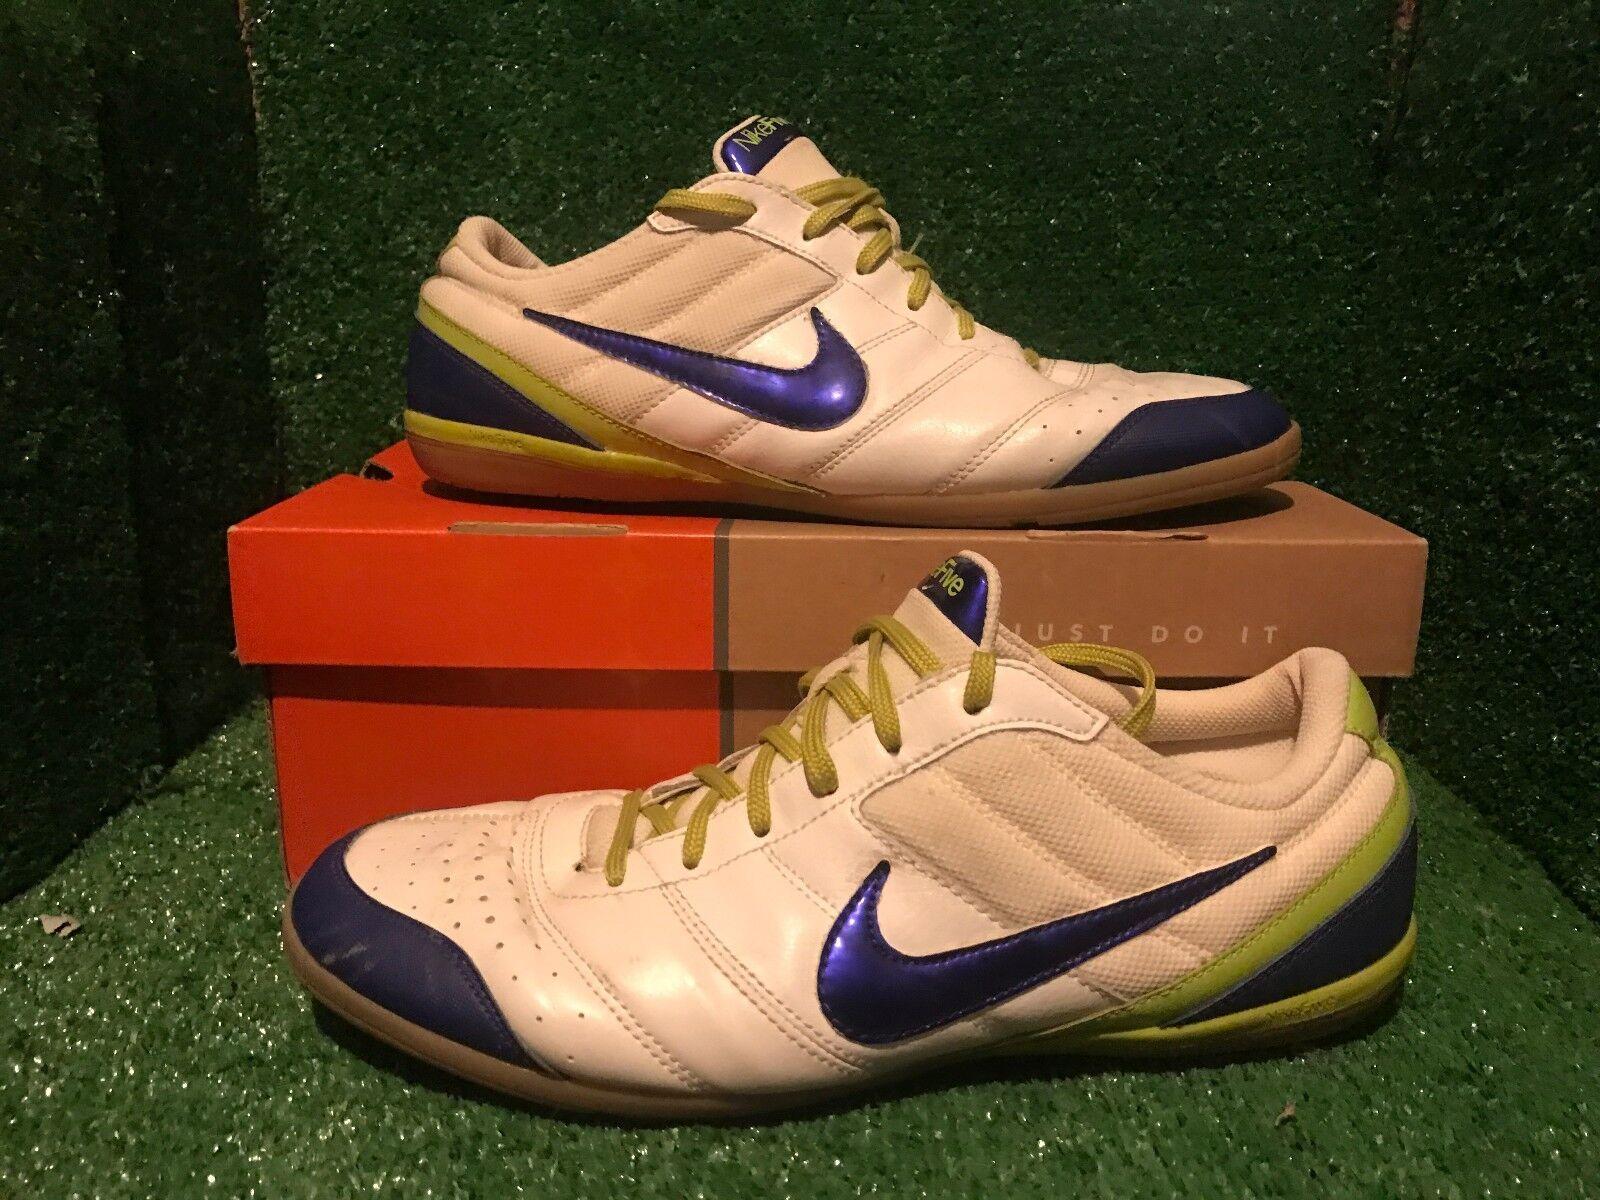 Nike Gato 5 Mercurial R9 Vapor Interior Zapatillas Zapatos deportivos de fútbol 10 9 44